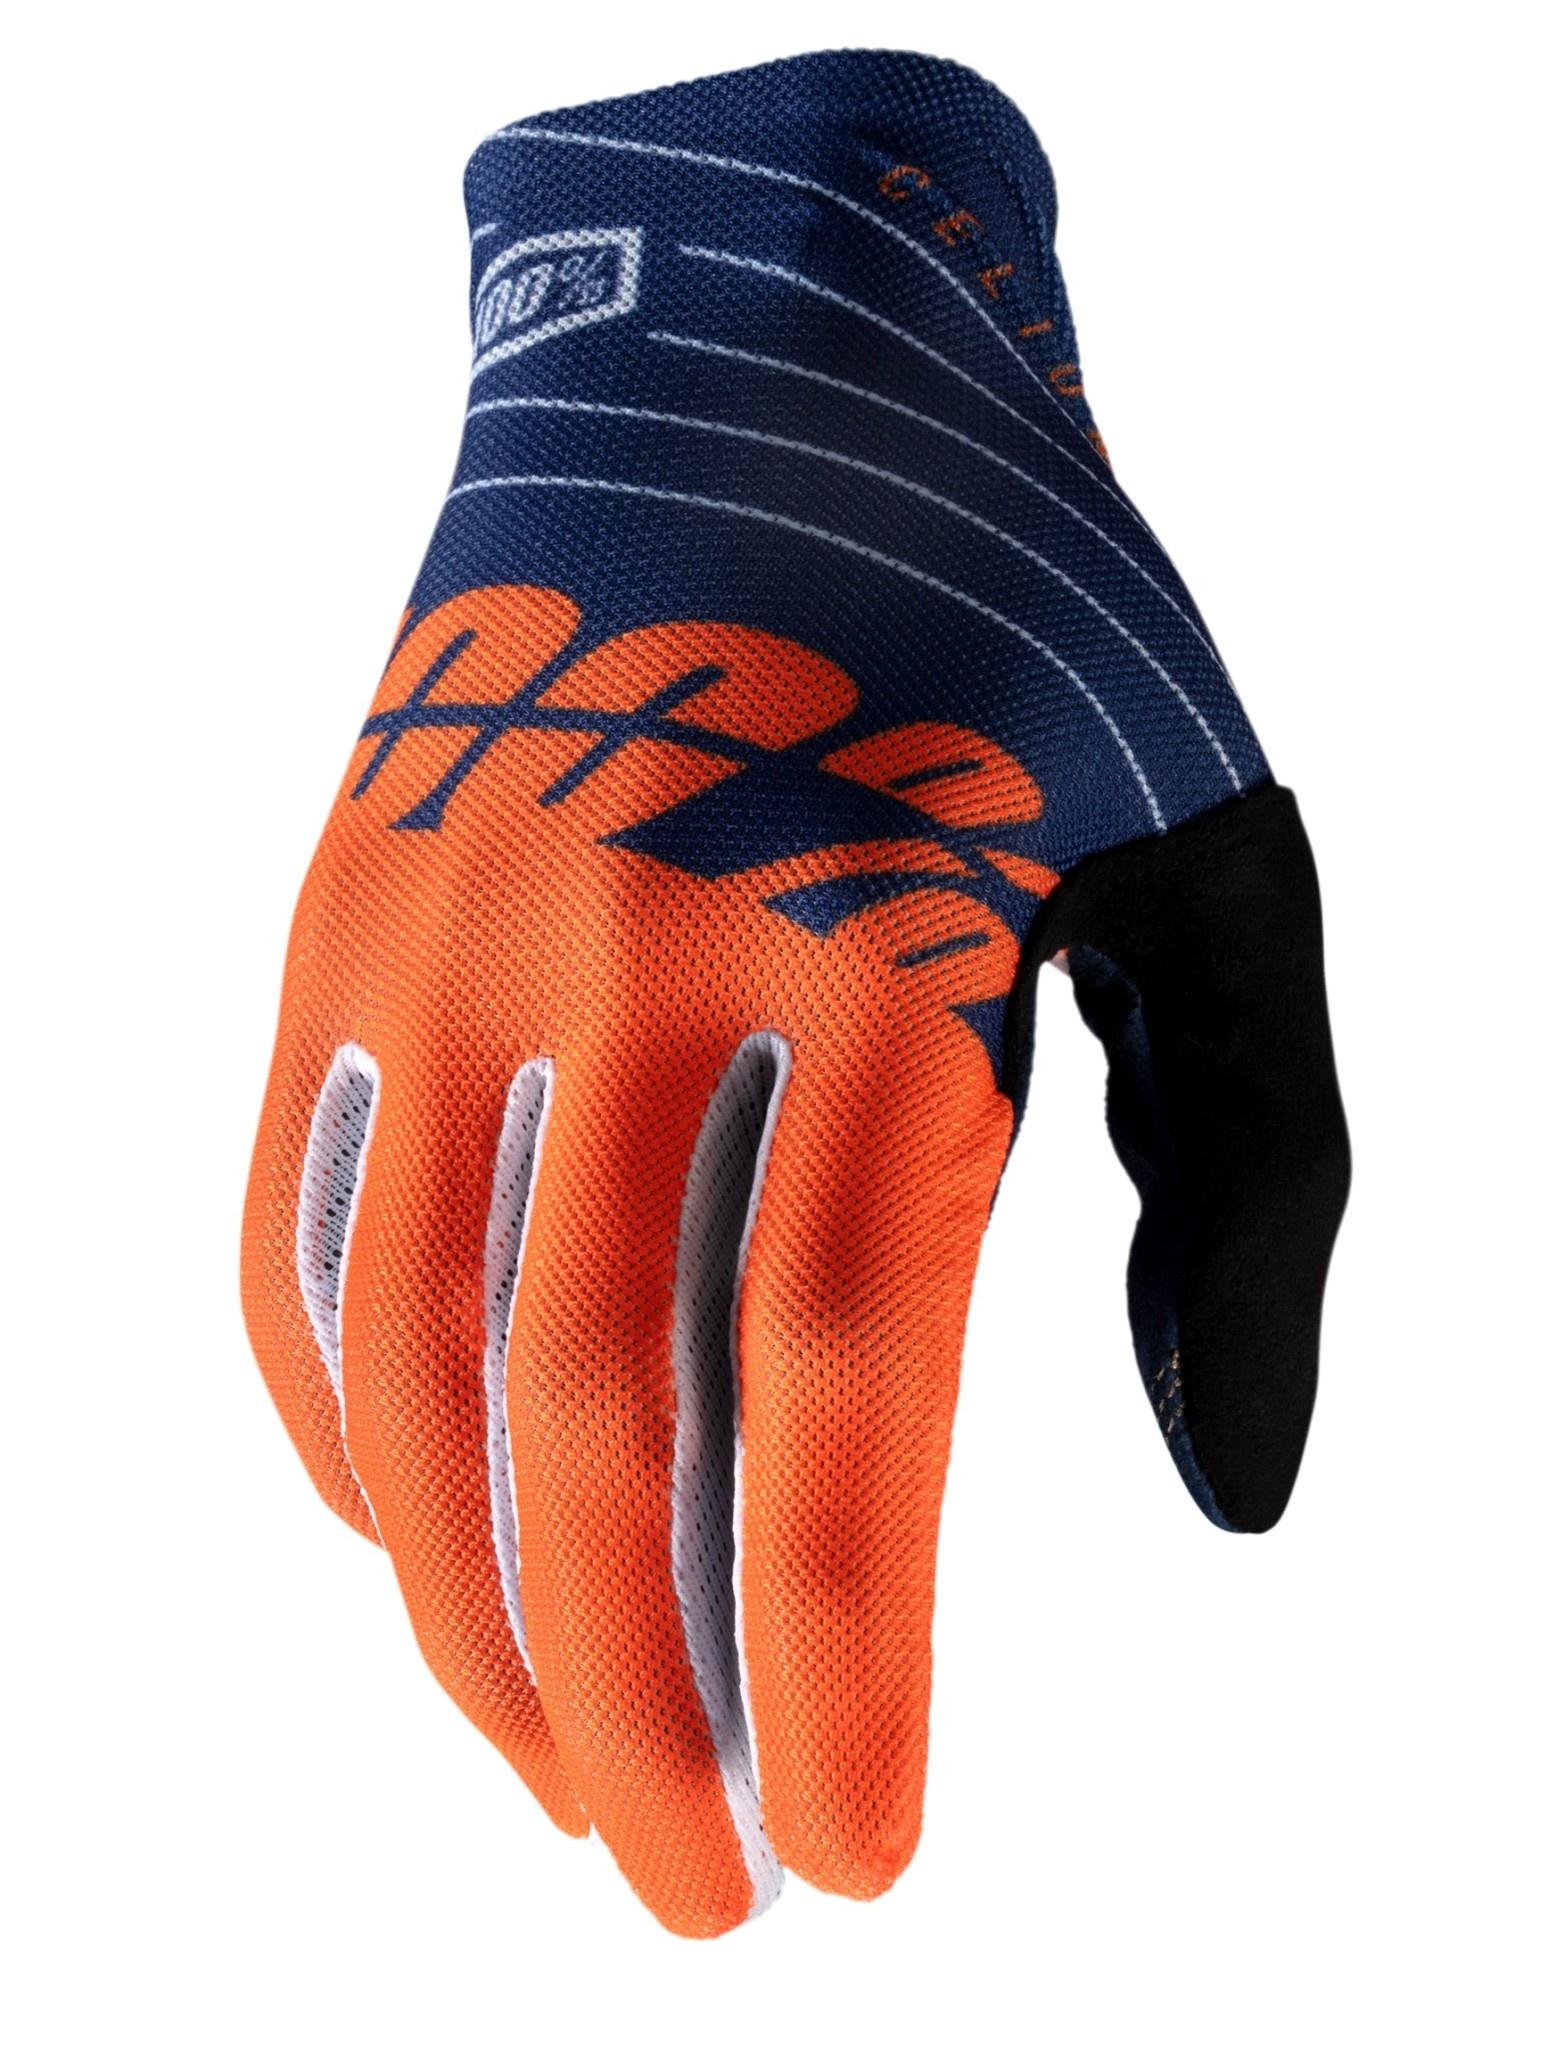 100% Celium Glove Orange / Navy-1